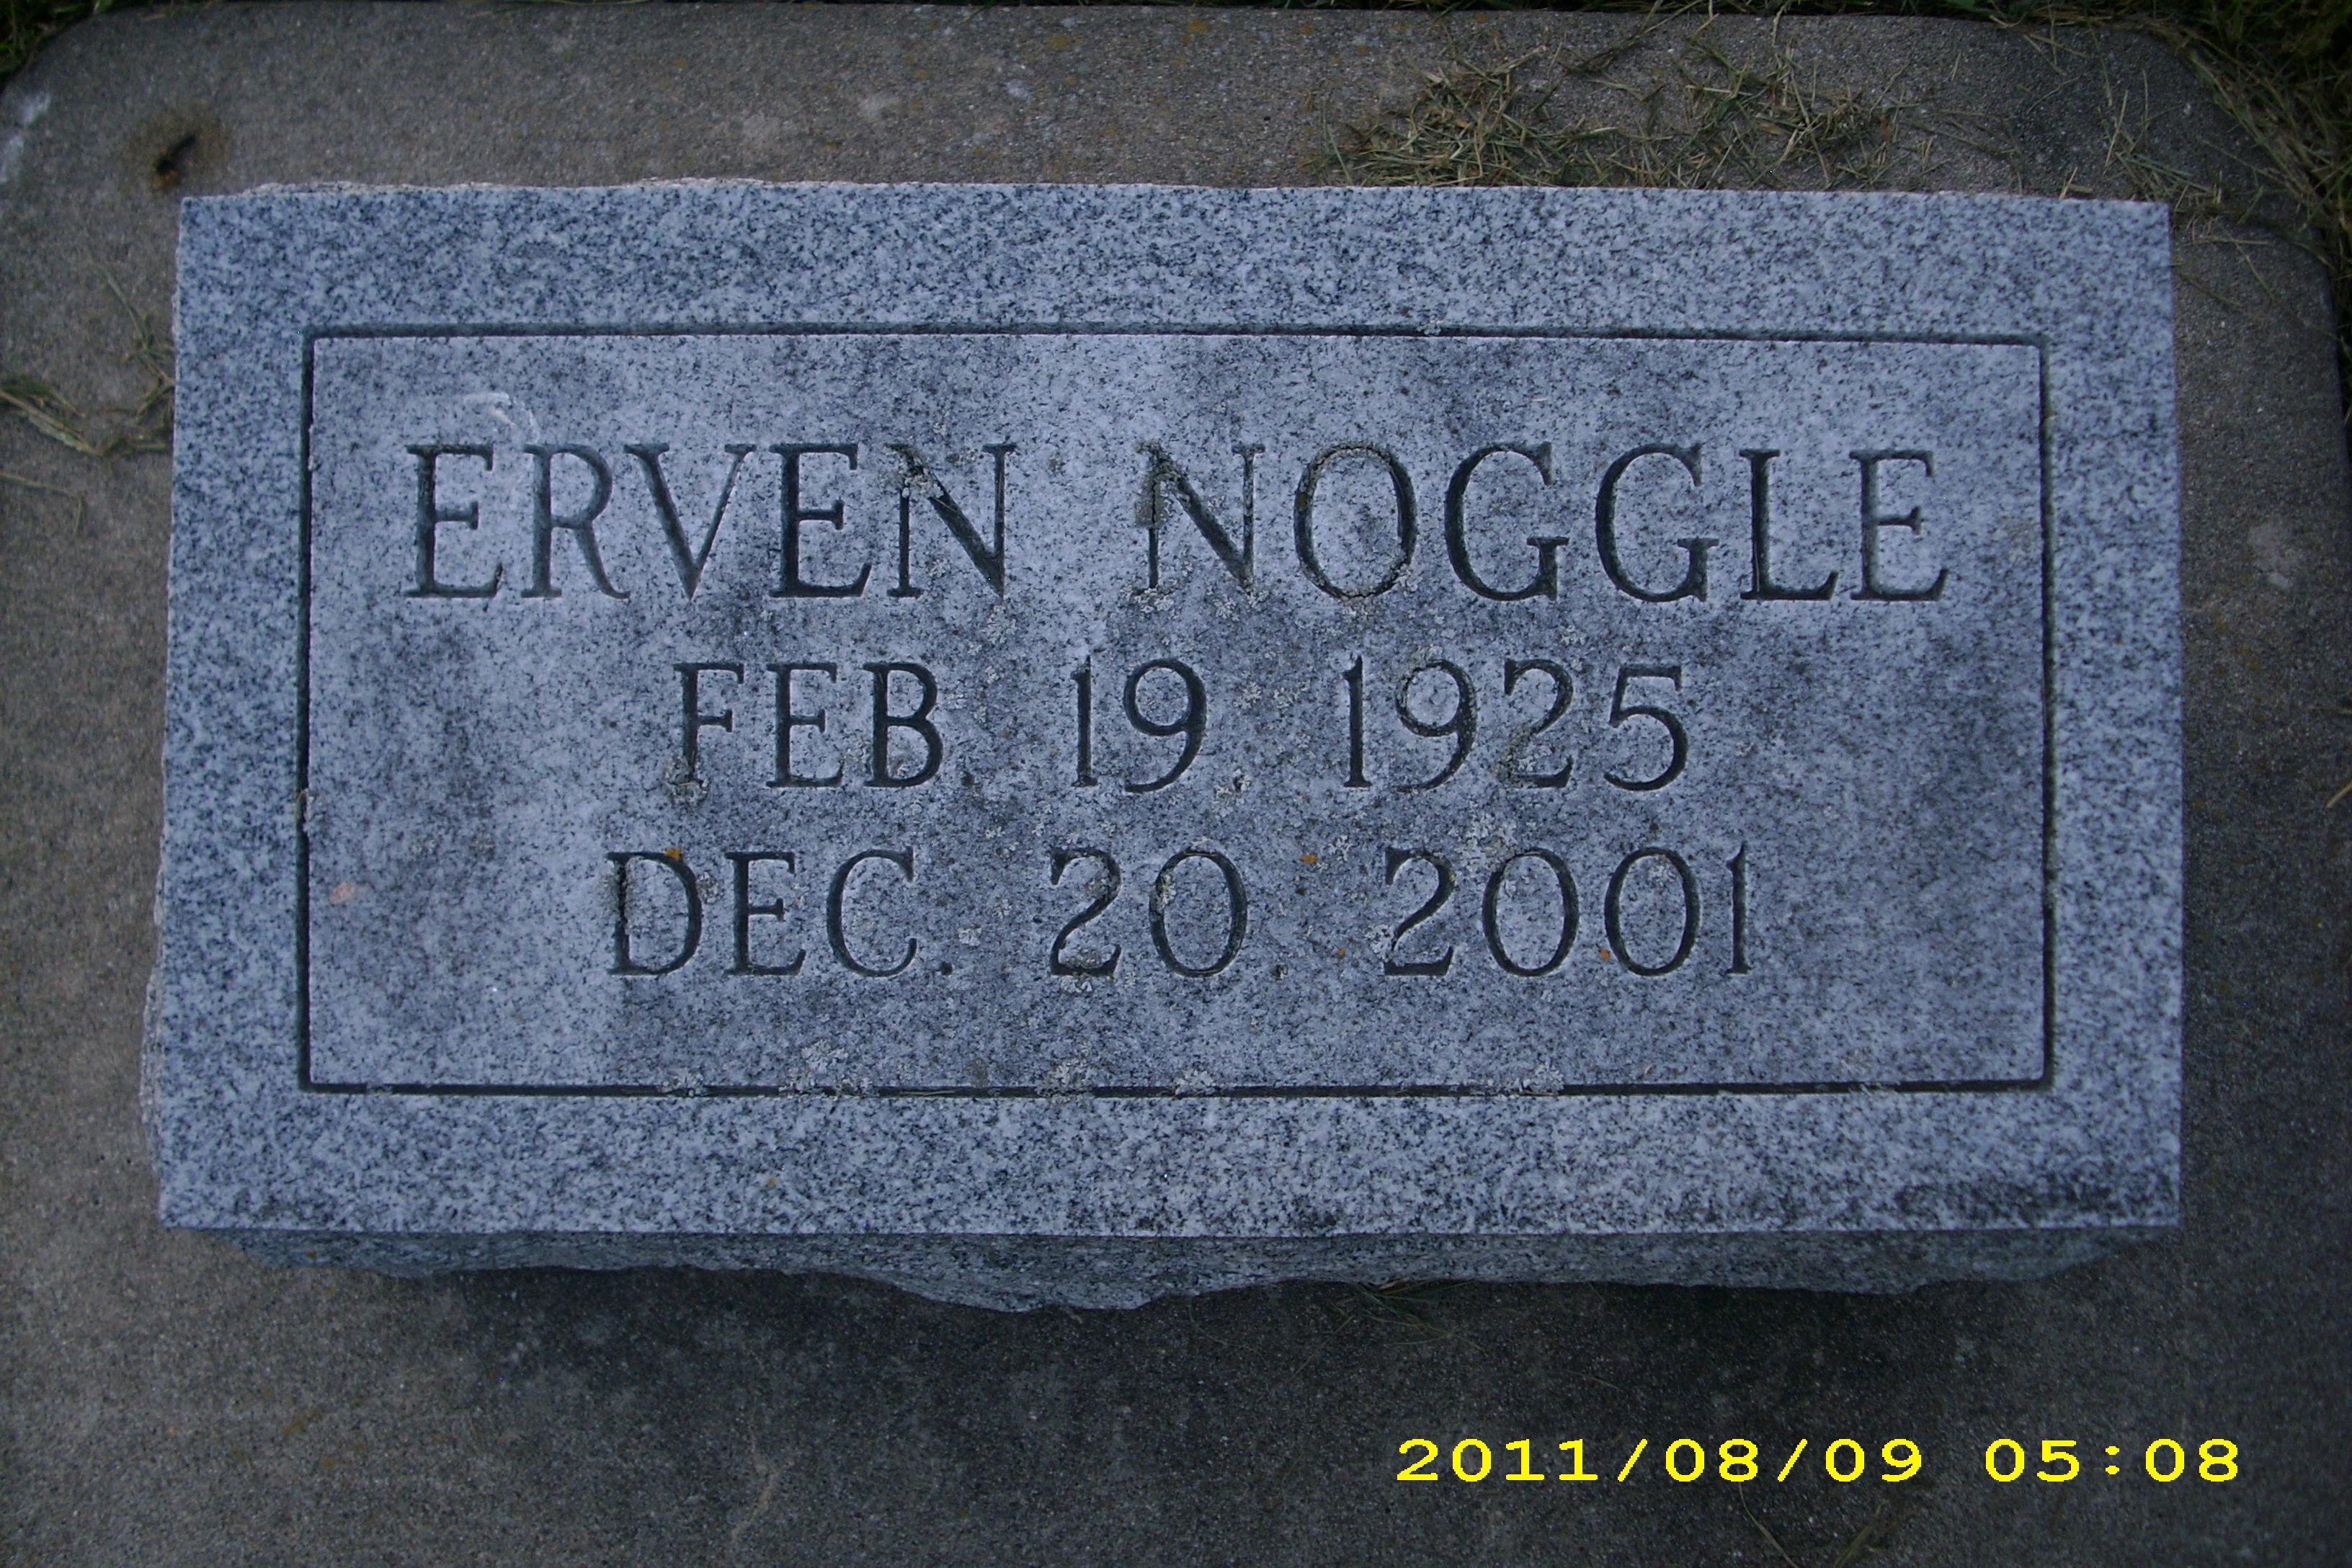 Irvin Clifford Noggle